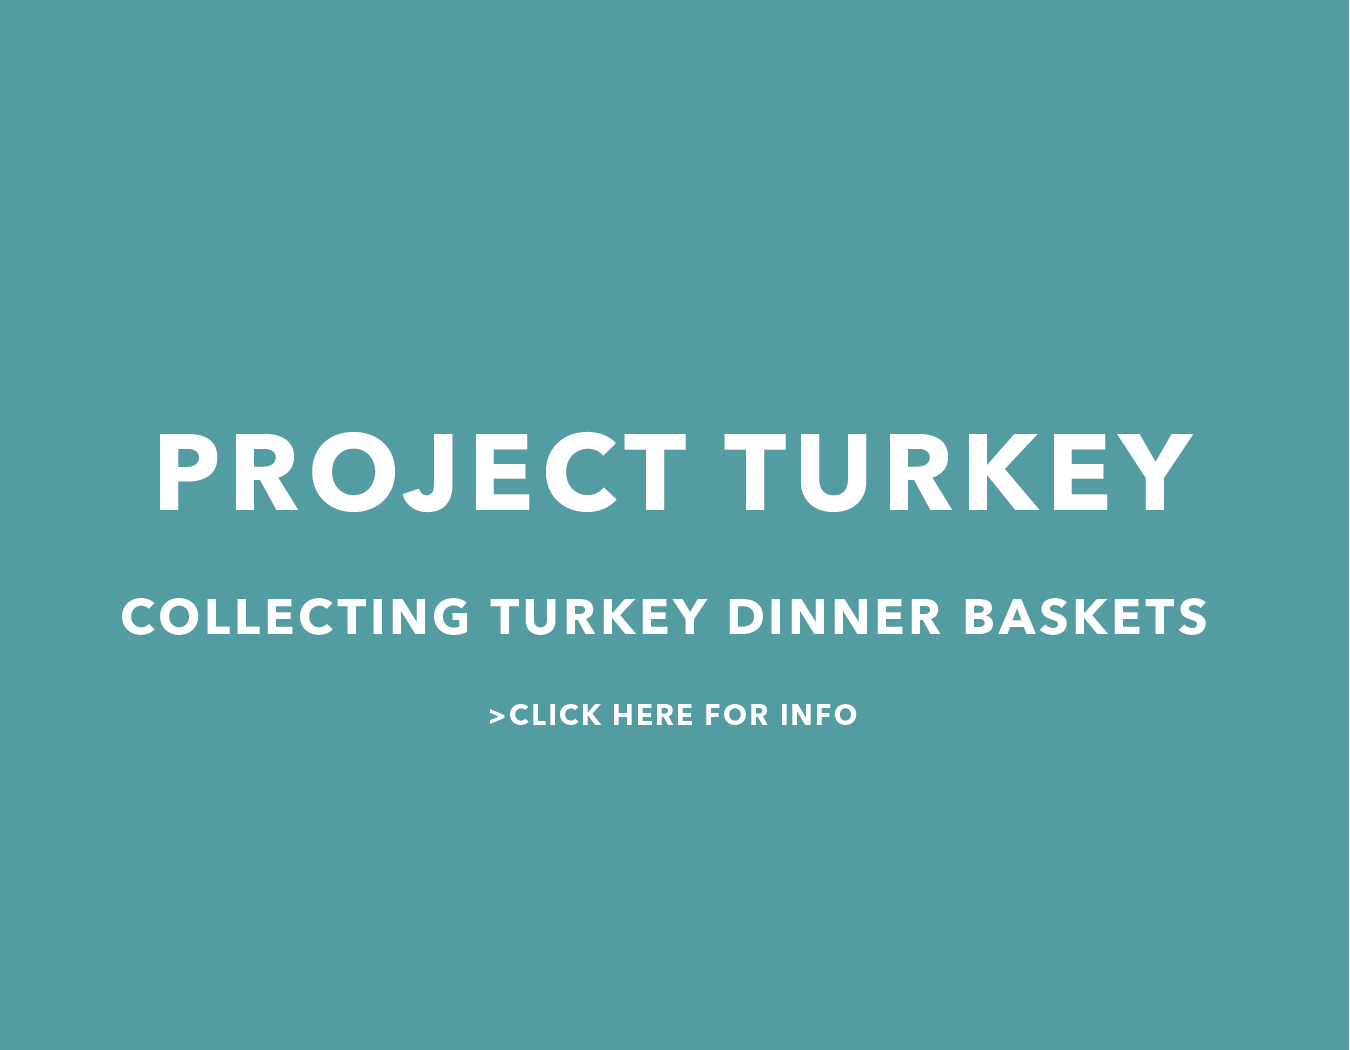 turkey01-01-01-01